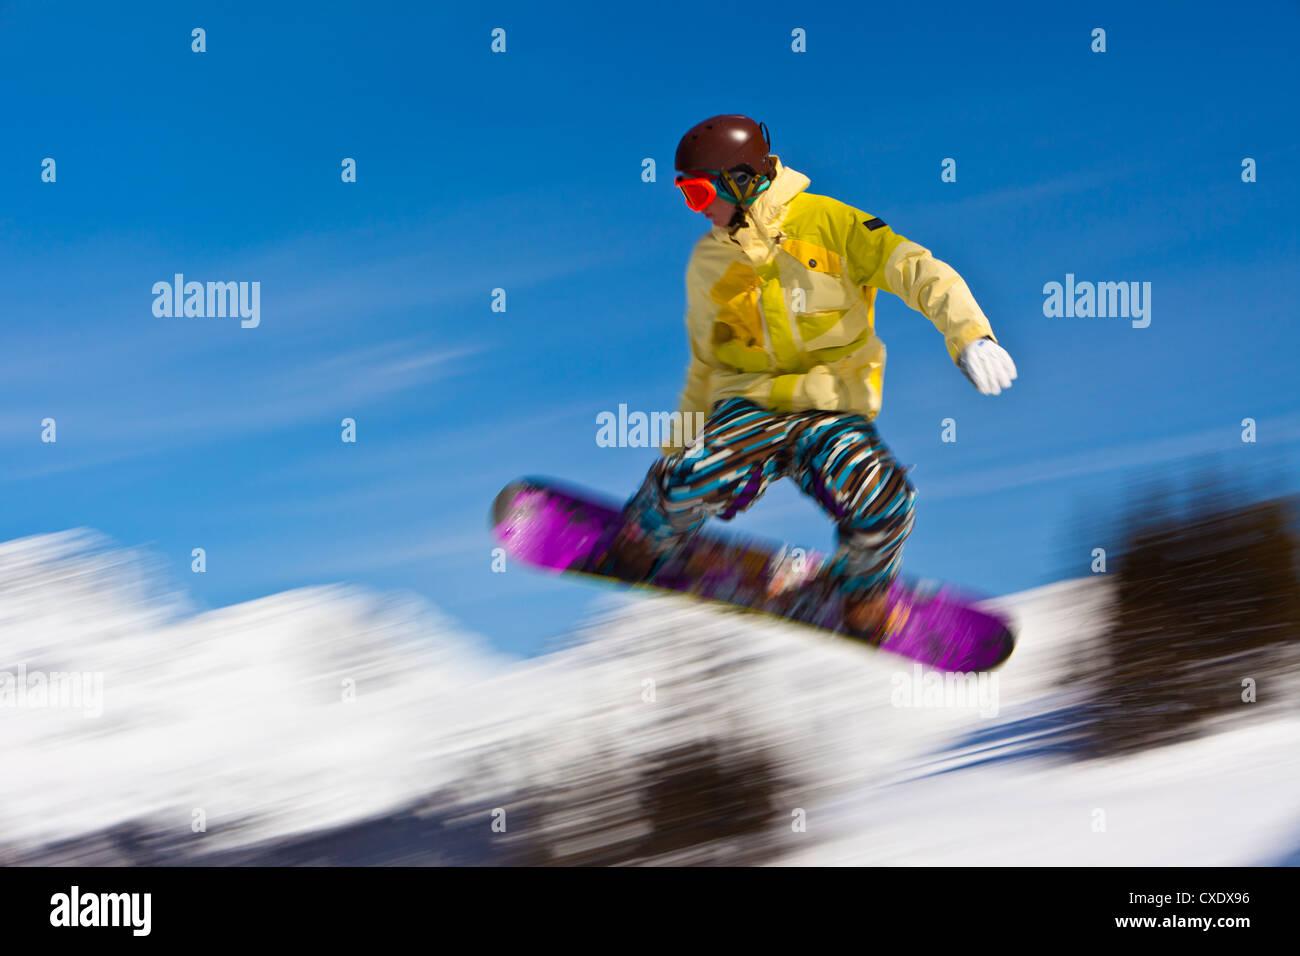 Snowboarder flying off a ramp, Whistler Mountain, Whistler Blackcomb Ski Resort, Whistler, British Columbia, Canada - Stock Image